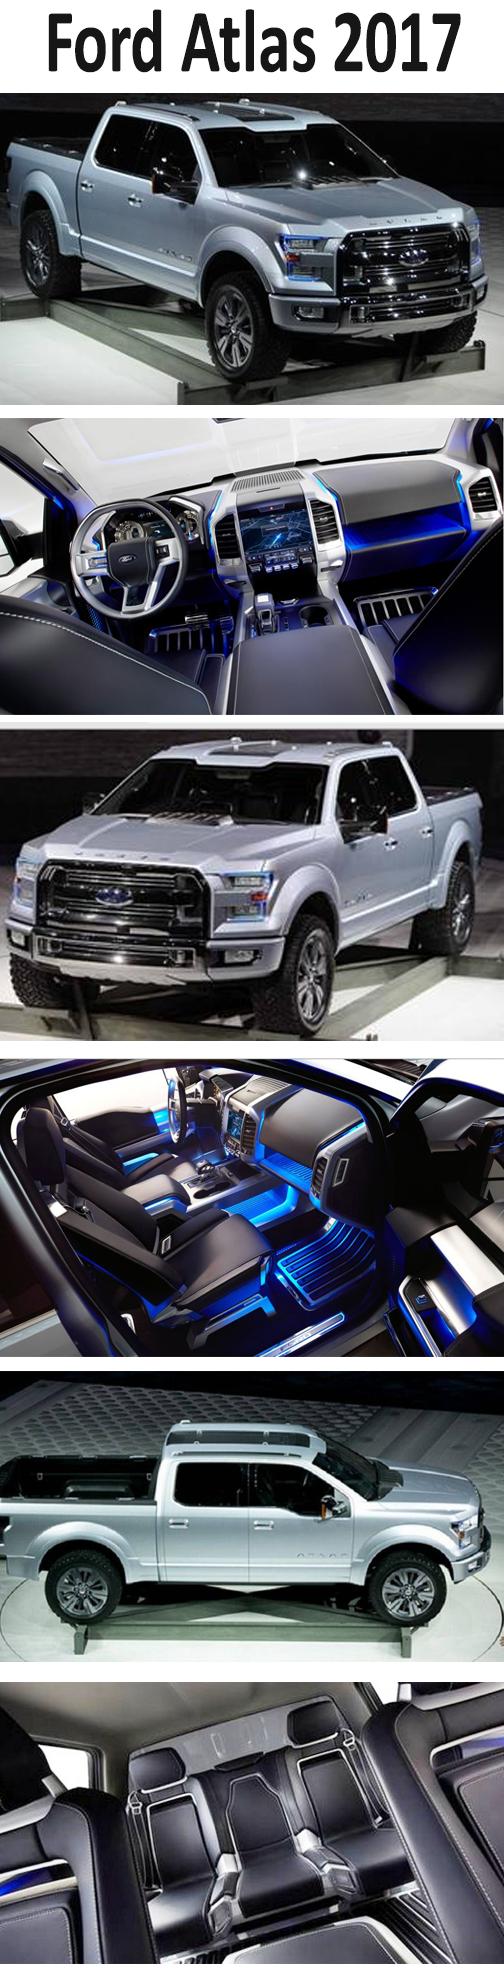 # Ford_Atlas 2017